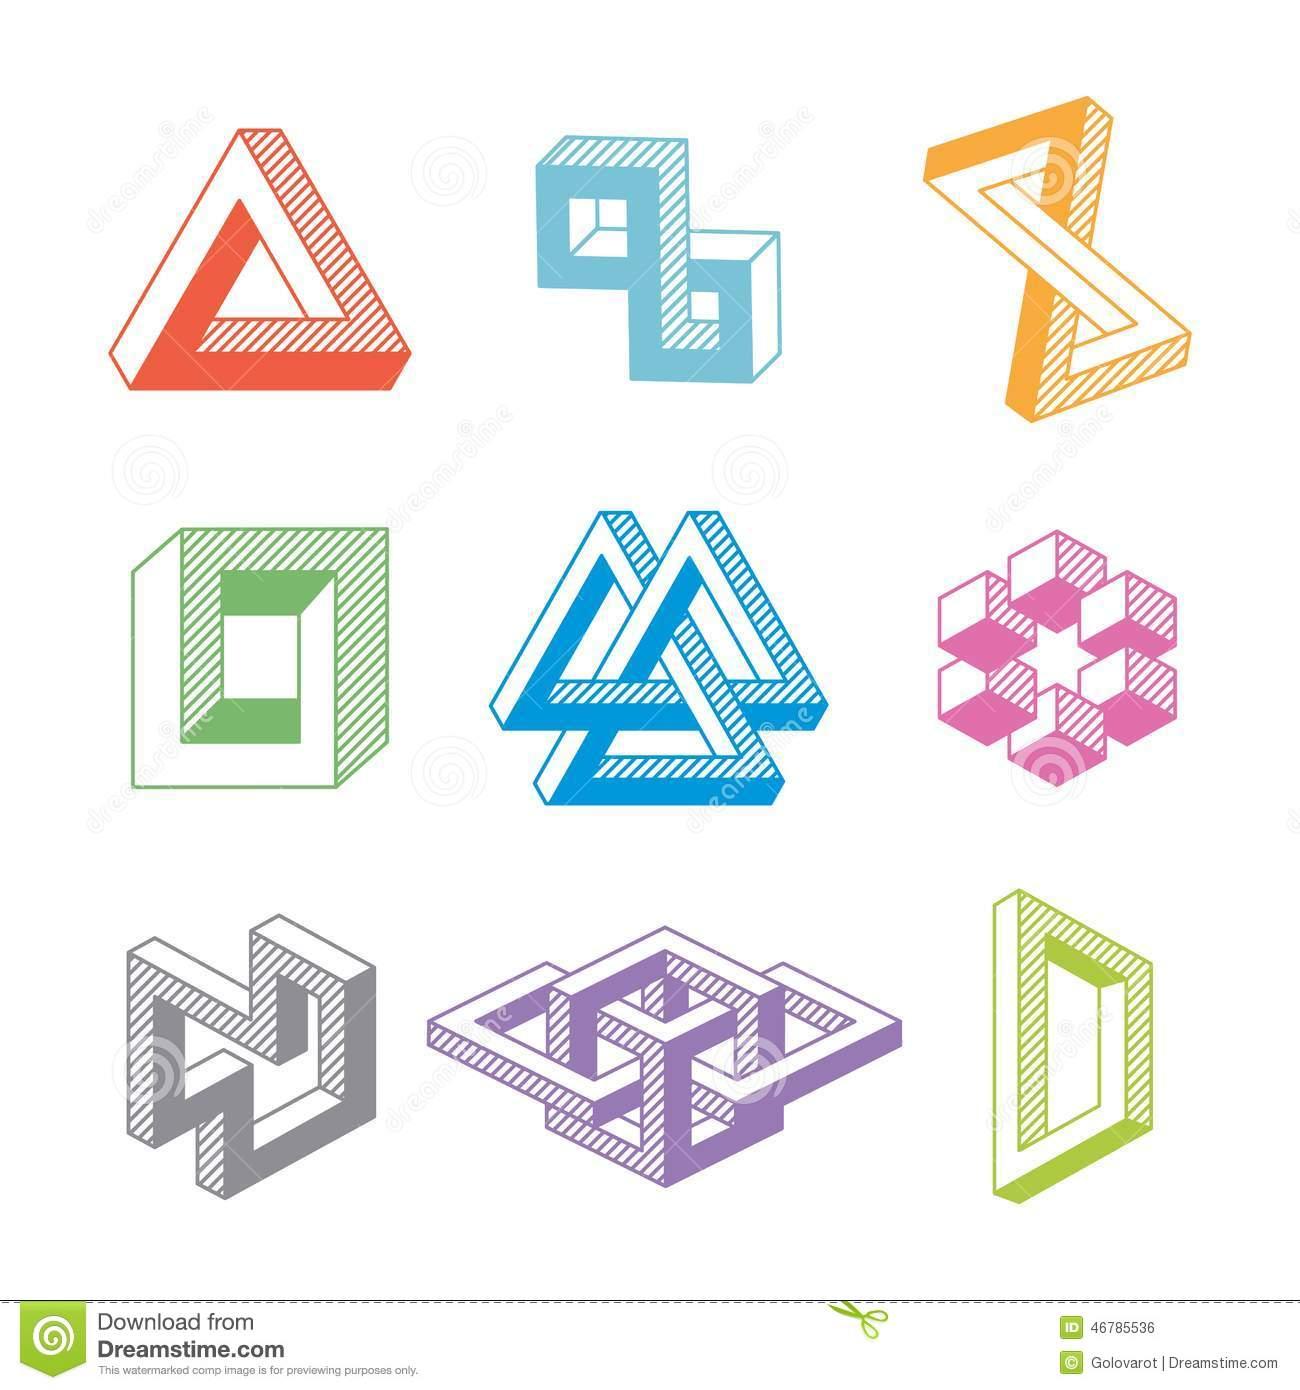 Illusion clipart geometric shape Impossible esque Search  figure